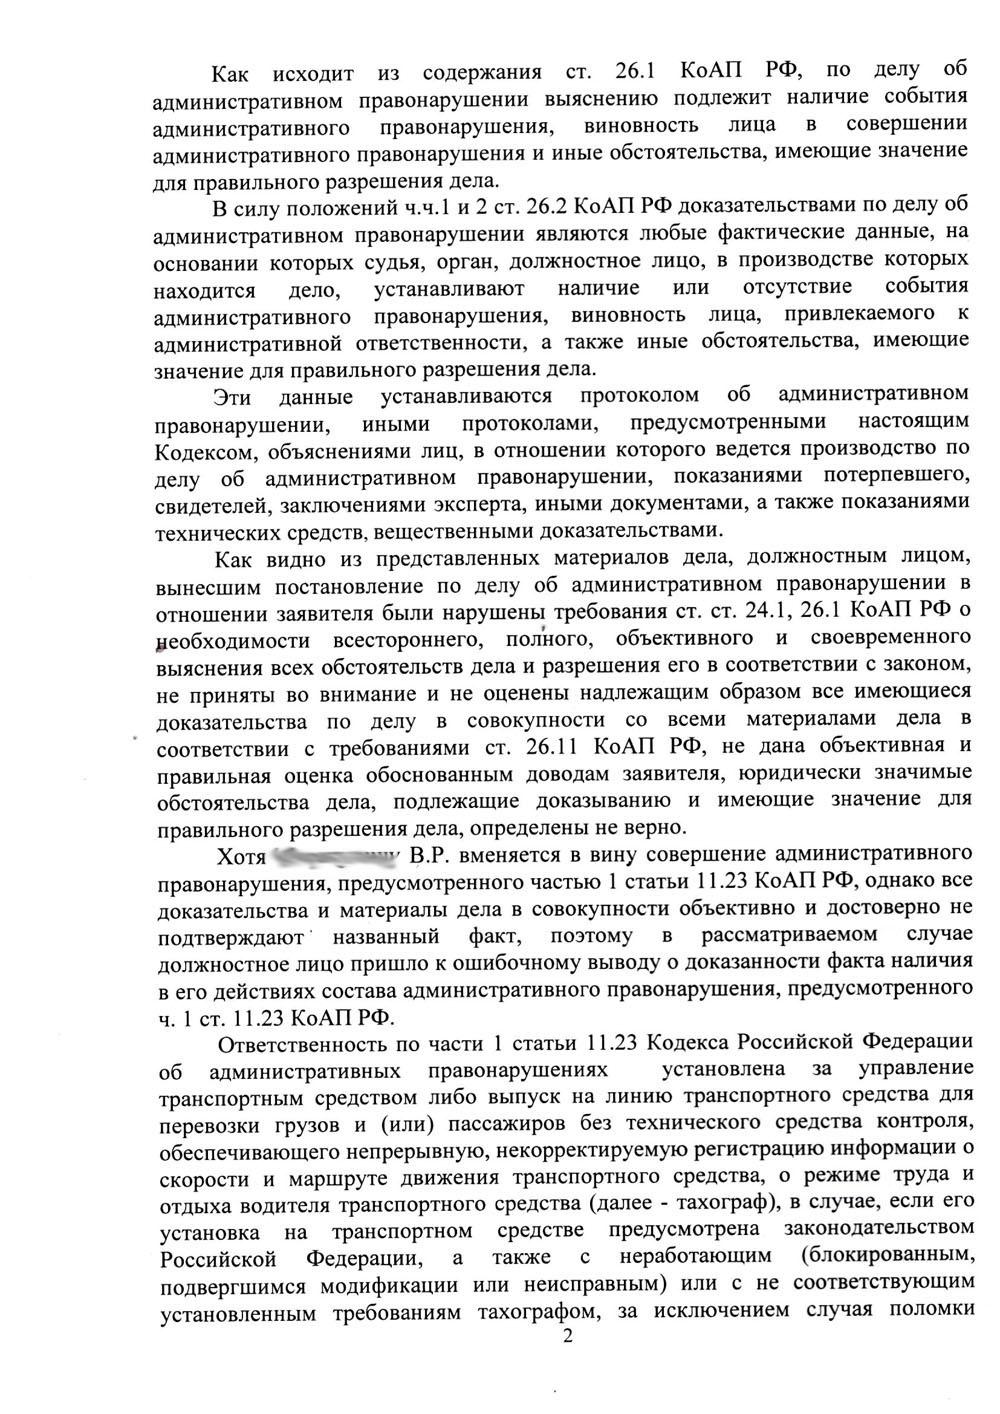 Решение суда Казань-2.jpg